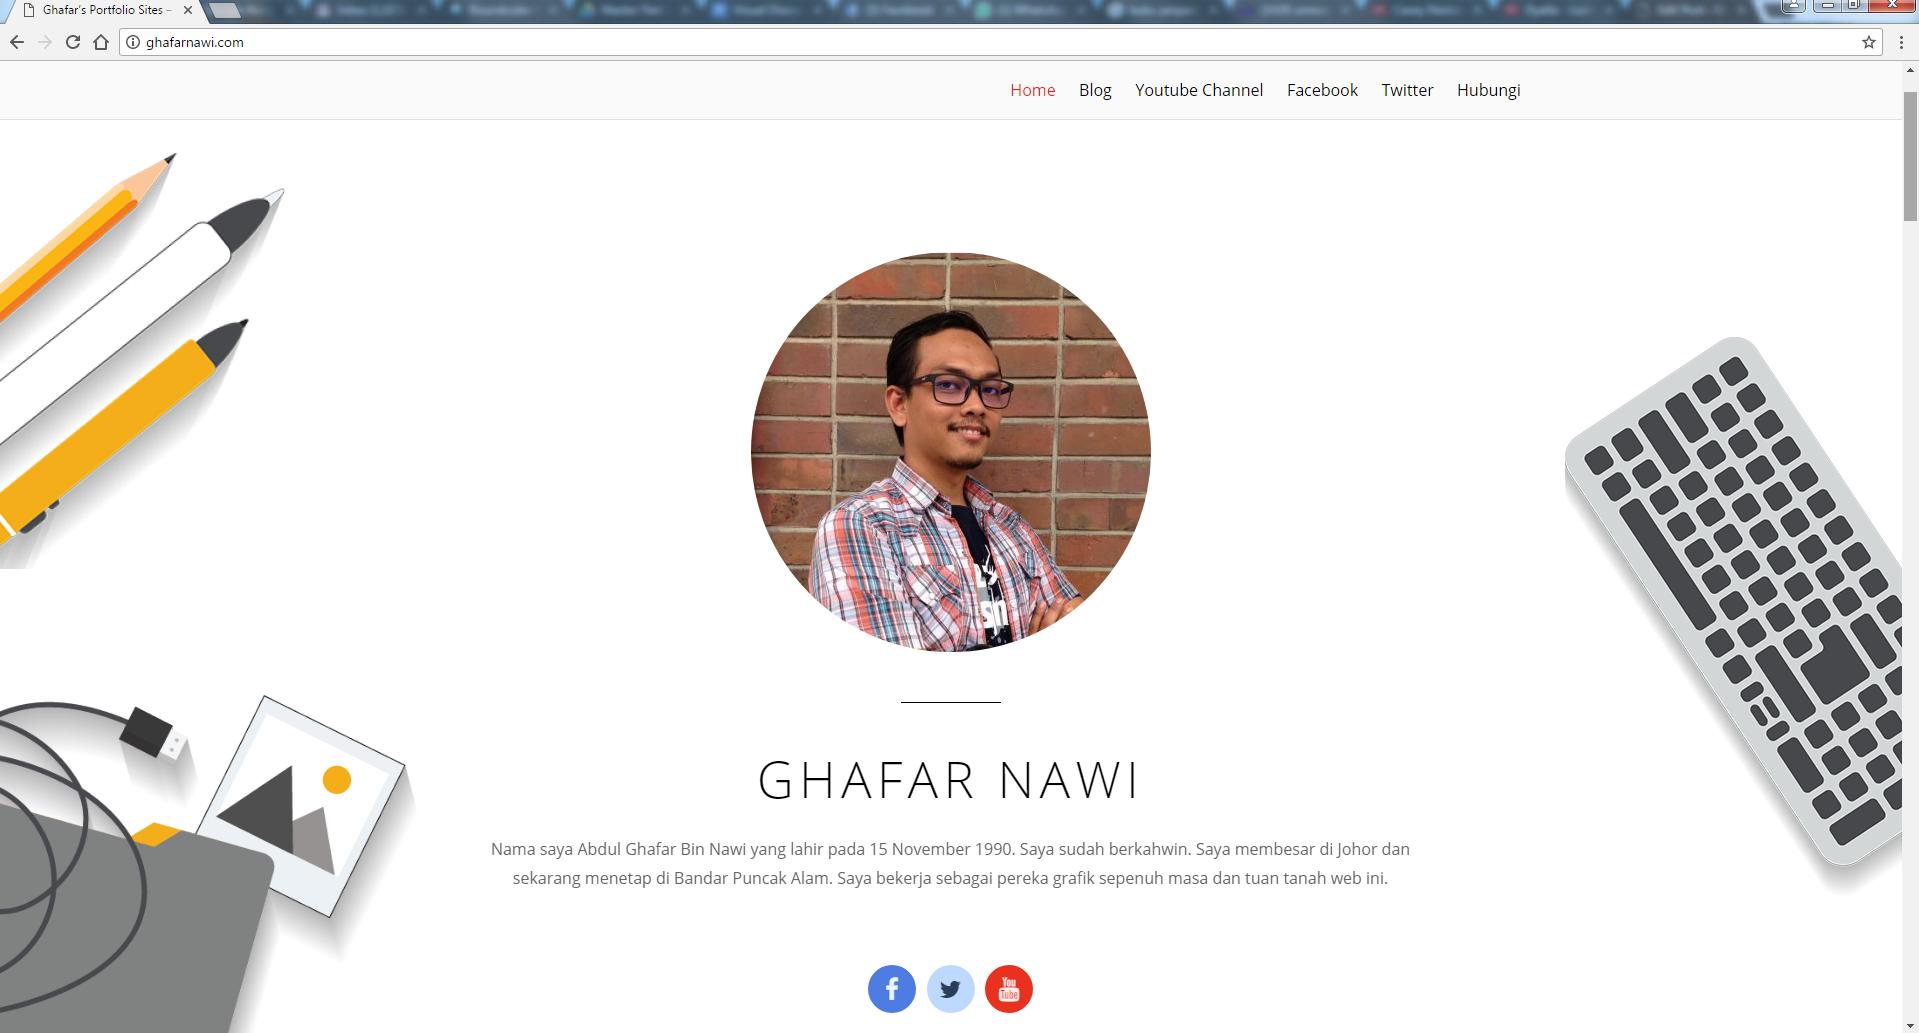 platform alternatif untuk freelance designer (ghafarnawi.com)